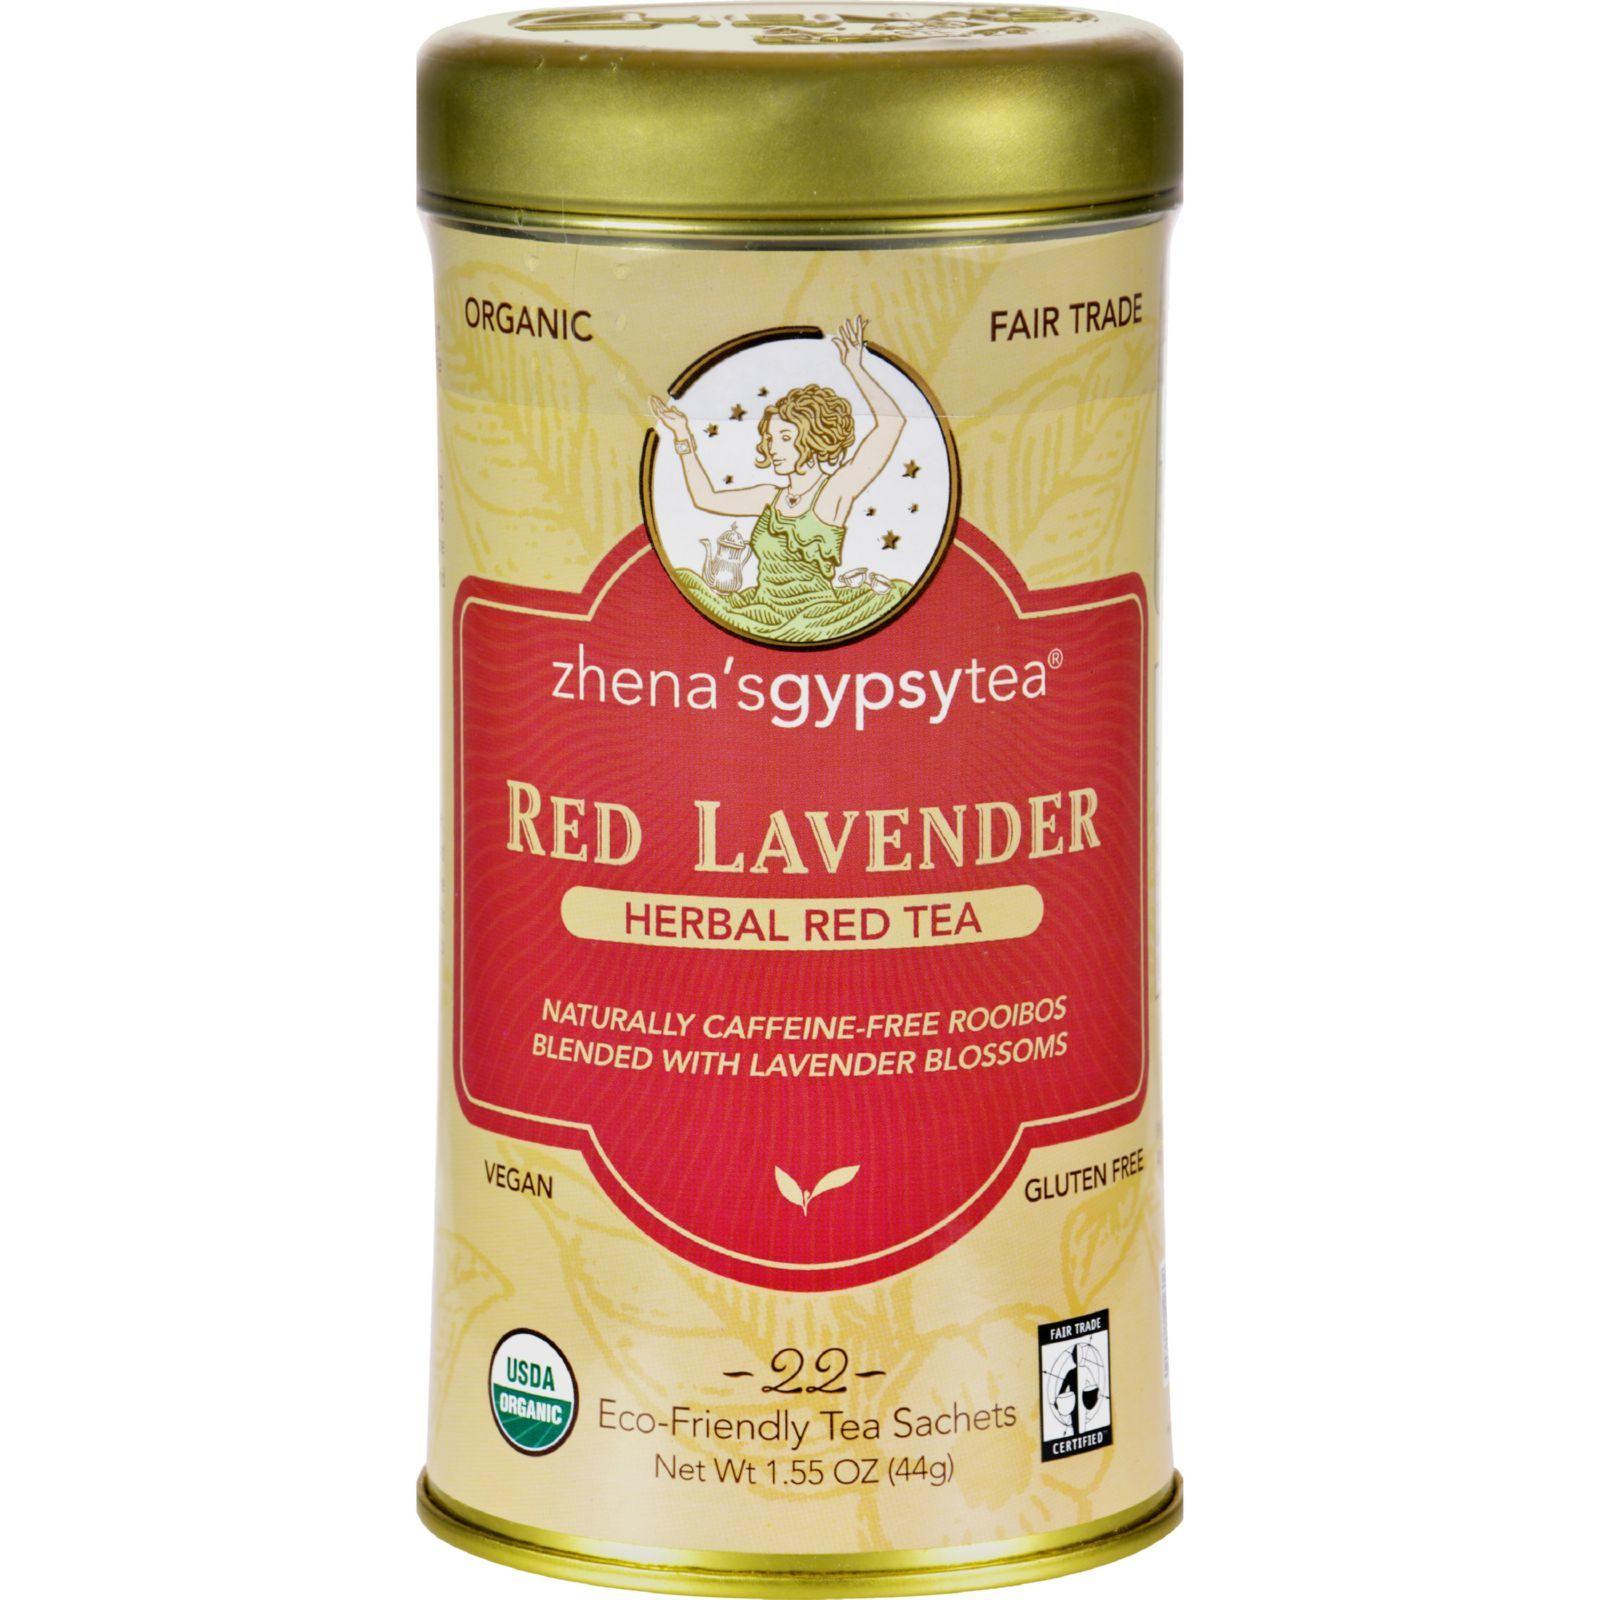 Zhena's Gypsy Tea Red Lavender Herbal Tea - Caffeine Free - Case of 6 - 22 Bags